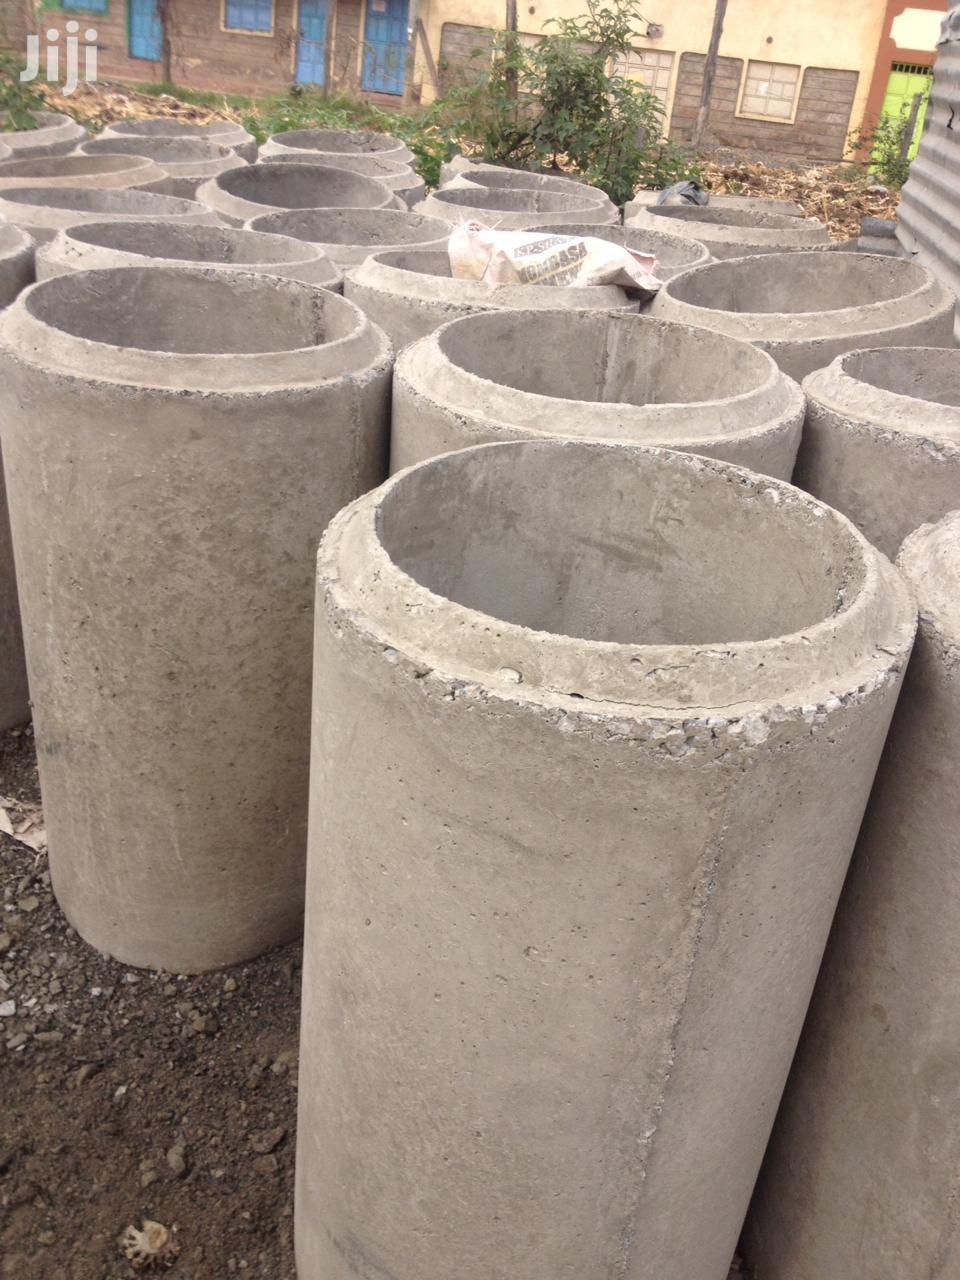 Modtec Durable Construction Materials   Building Materials for sale in Utalii, Nairobi, Kenya